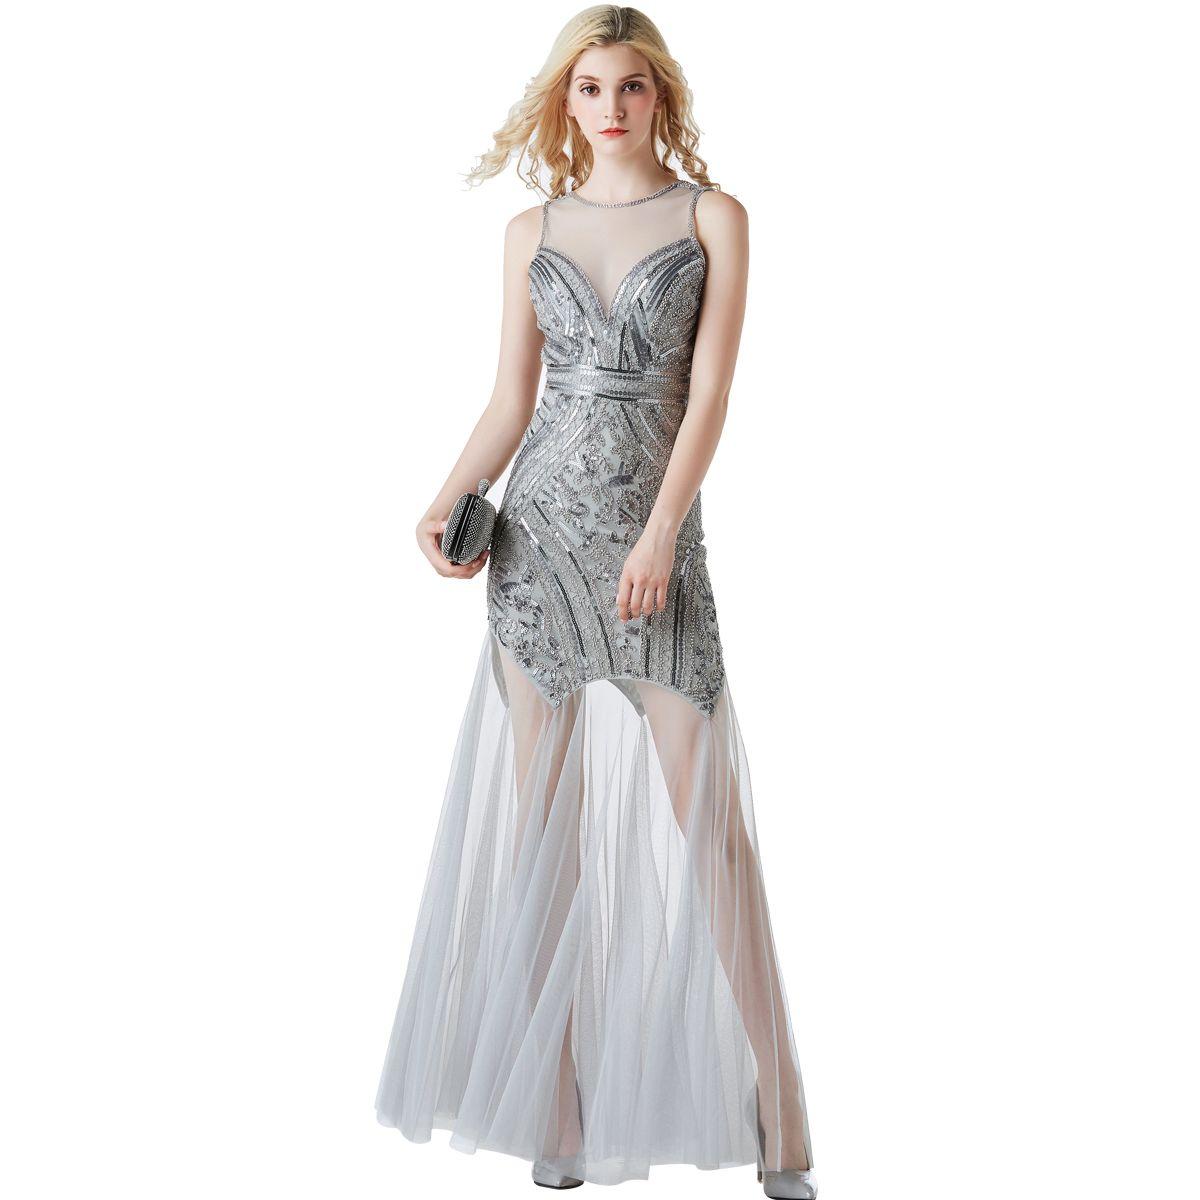 2019 Sequin Long Evening Dress Formal Party Vintage